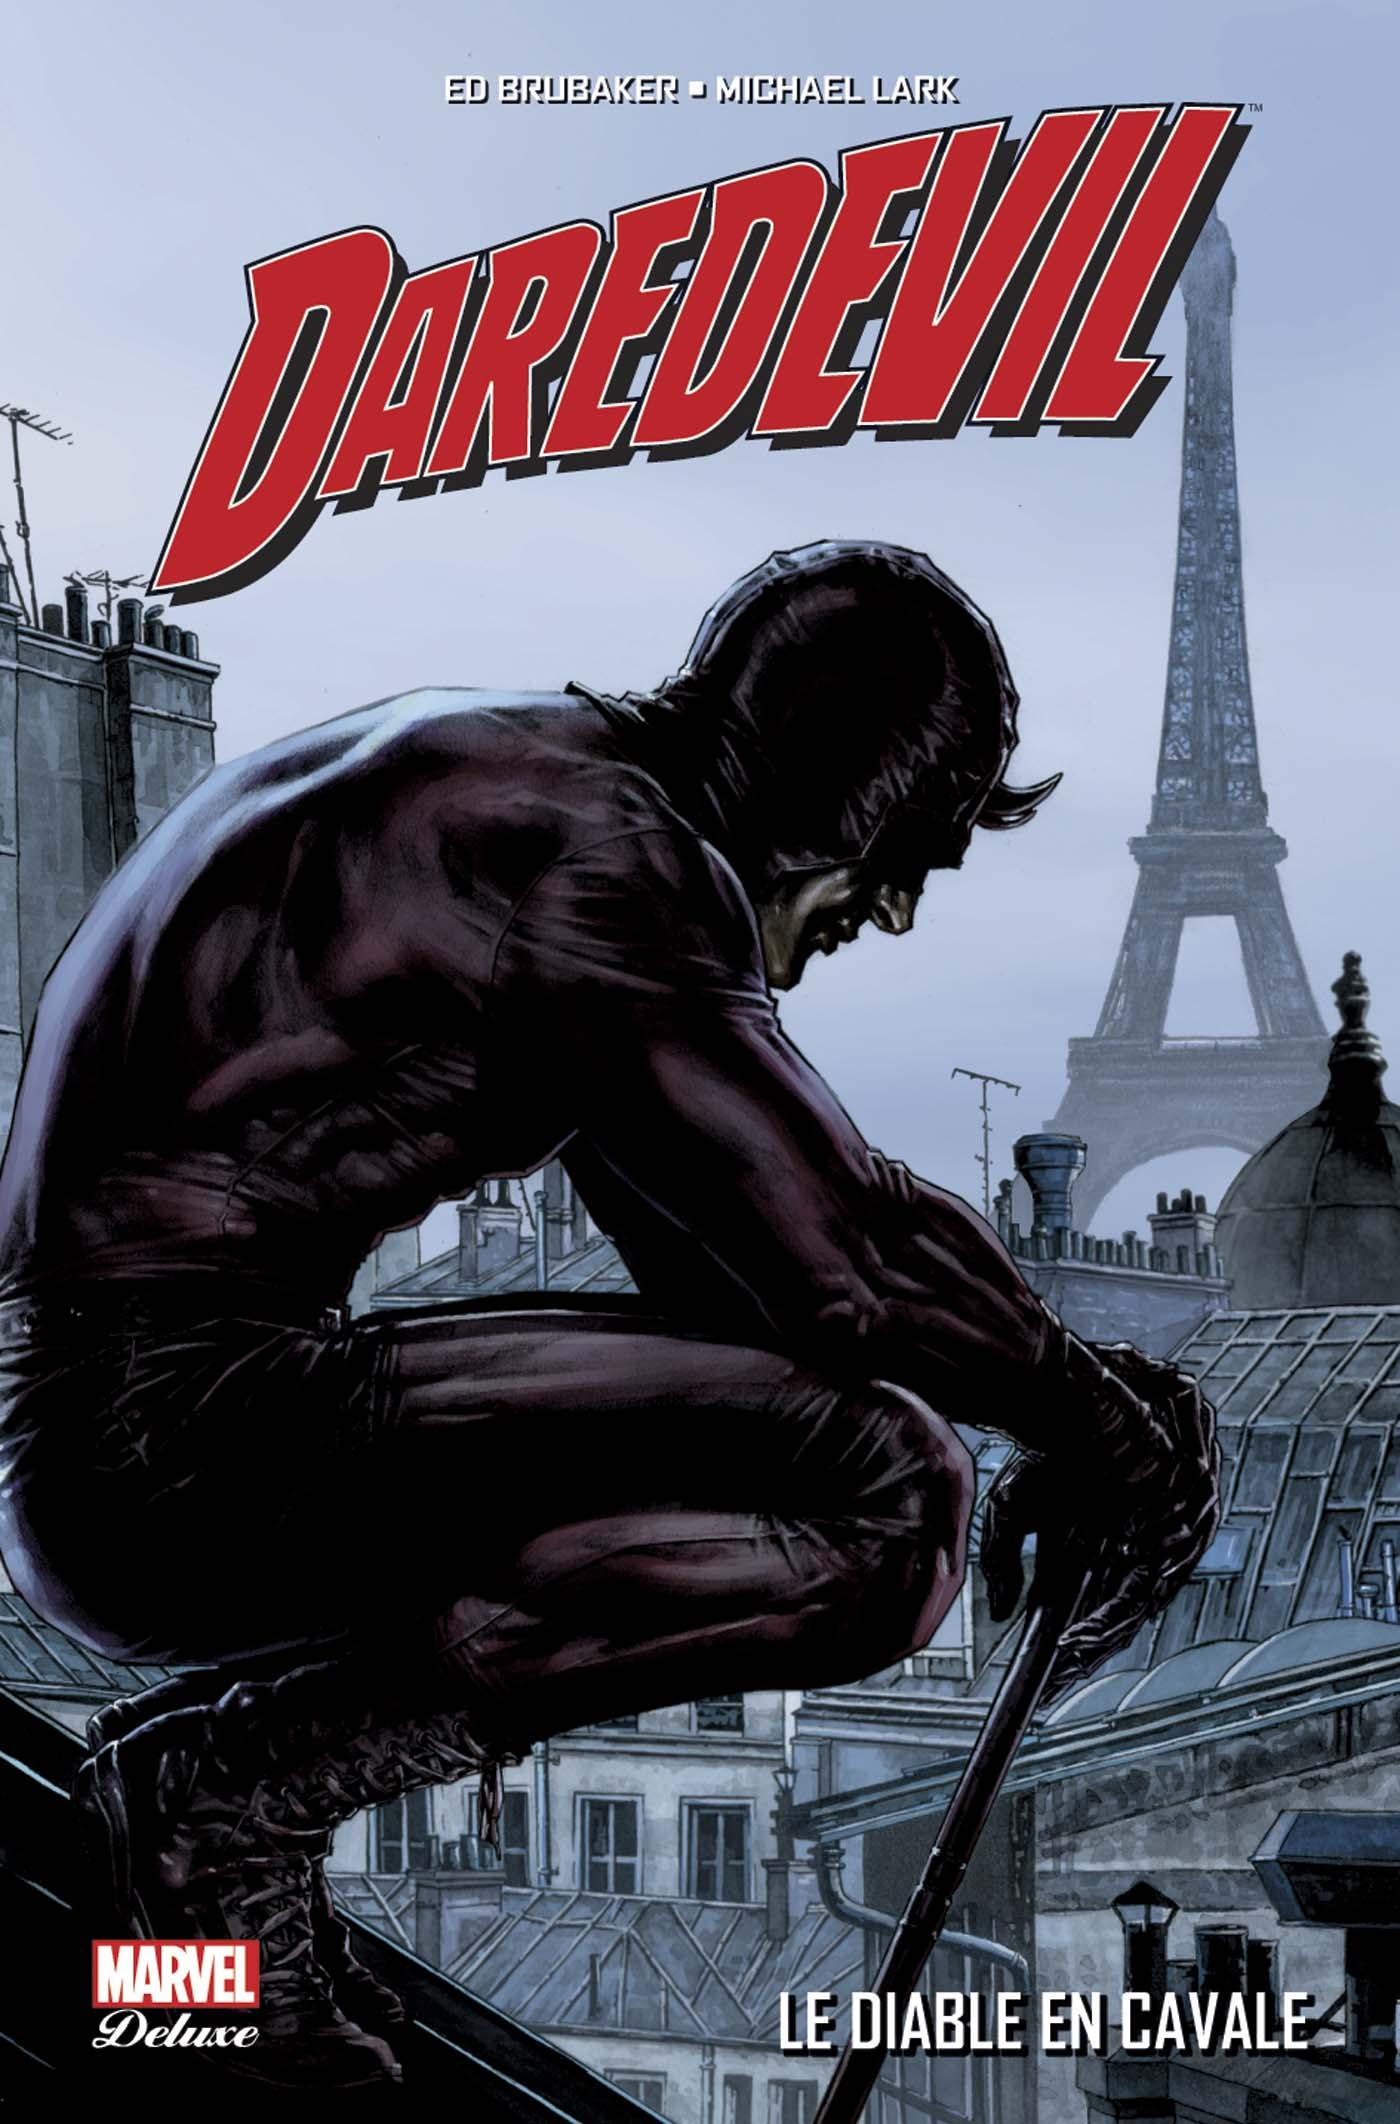 Daredevil 1 - Le diable en cavale